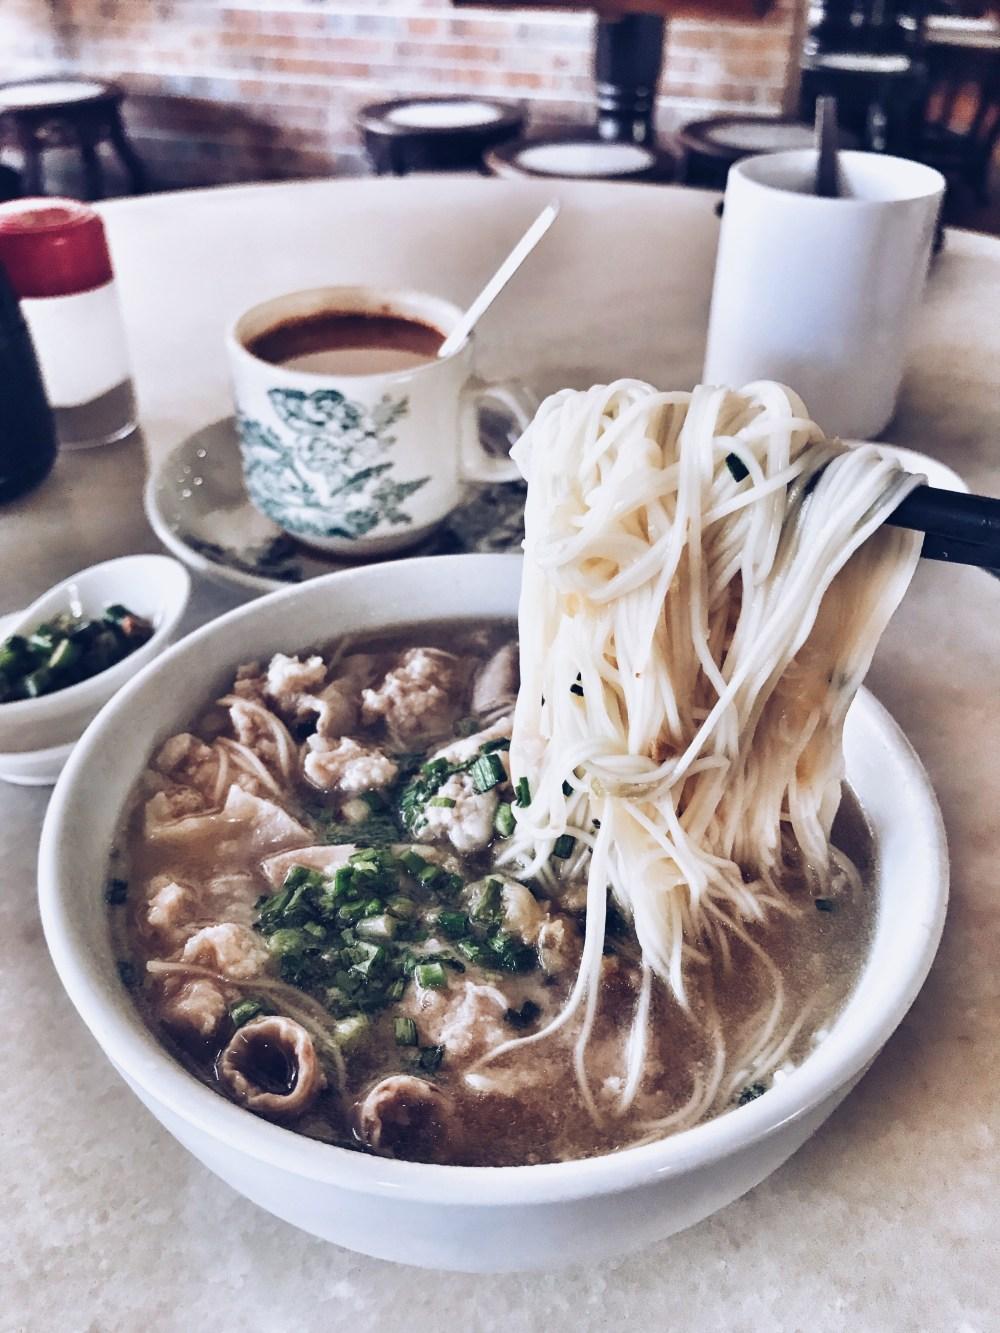 22 March 2020: Hon Kei Food Corner